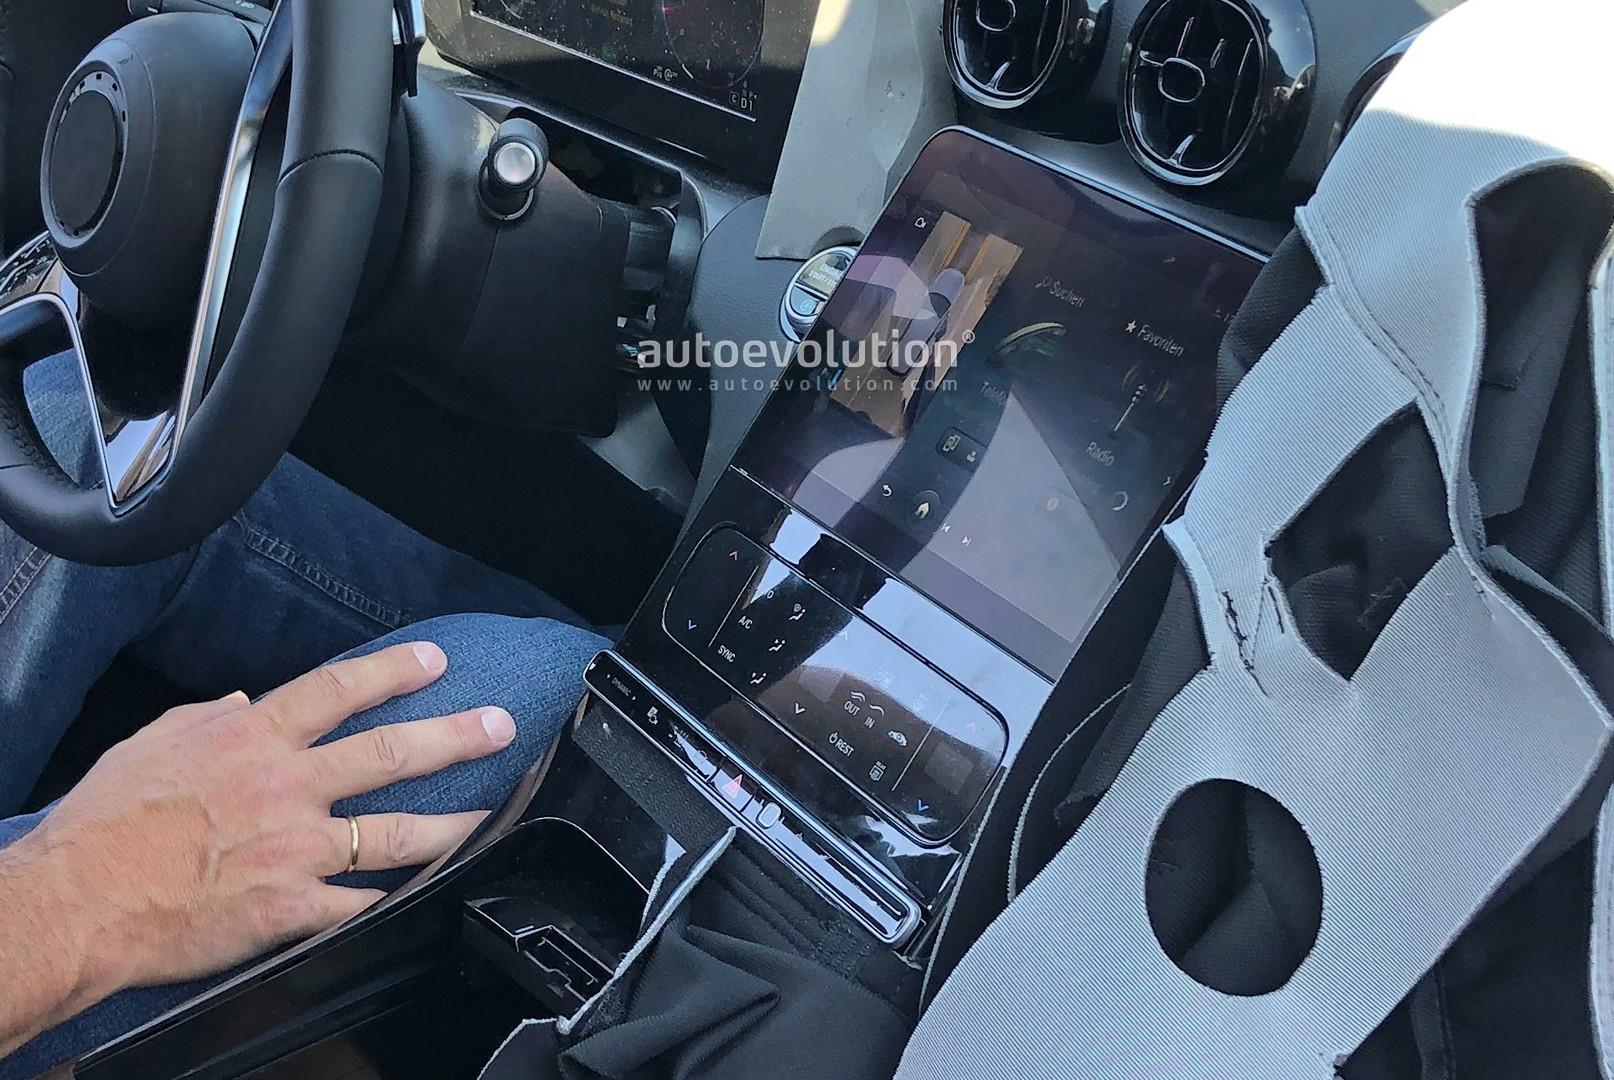 2021 mercedes c-class interior spied in detail  looks insane